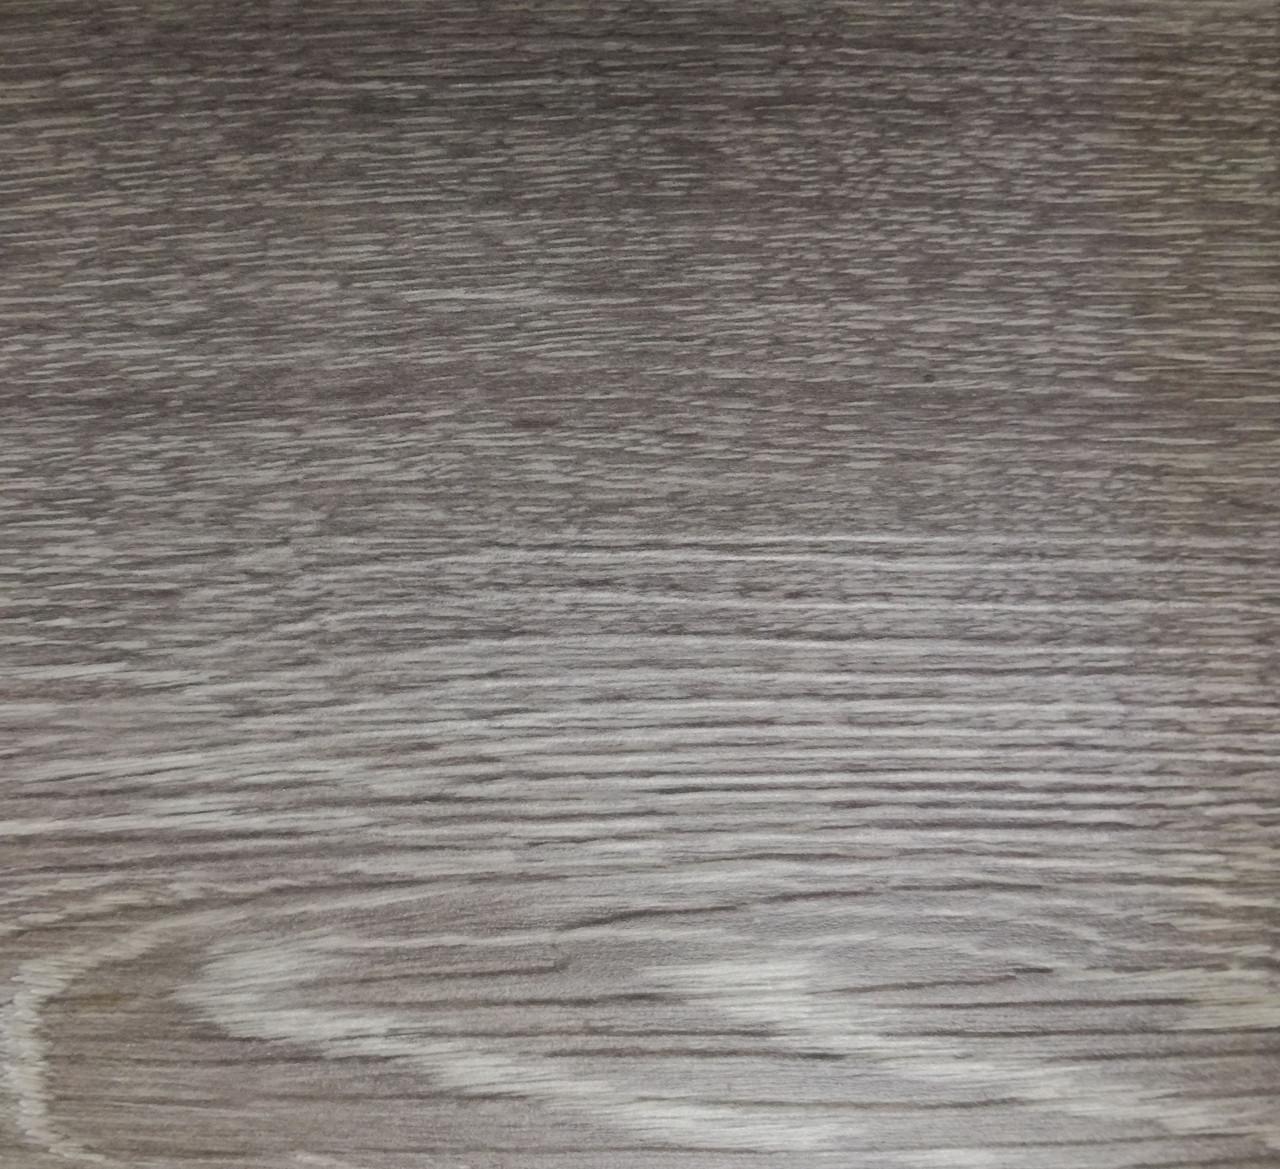 Плитка ПВХ Moon Tile RT 09